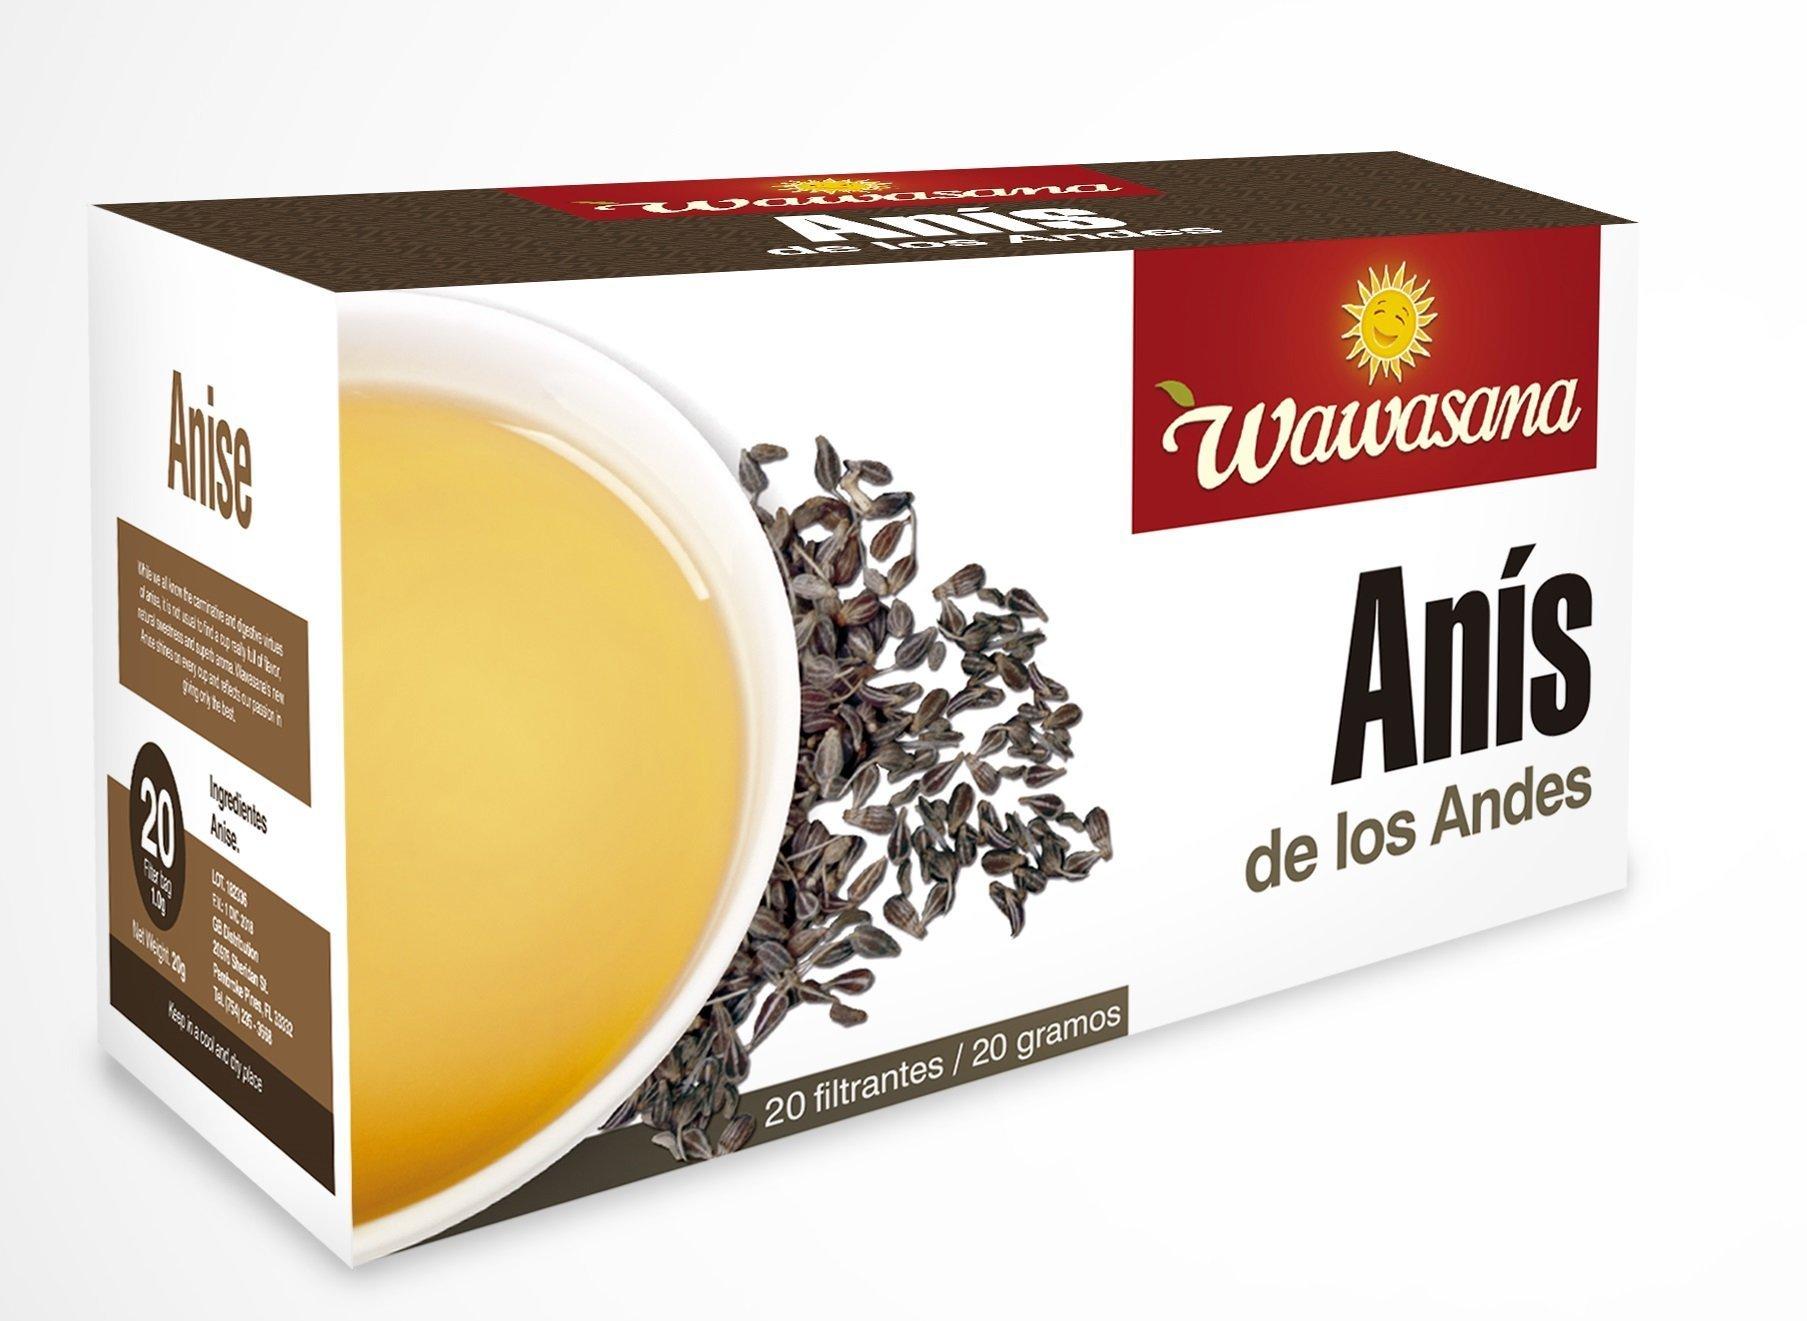 Wawasana.ANISE TEA 100% Pure Anise, from Peru. 20 teabags, 20 grs